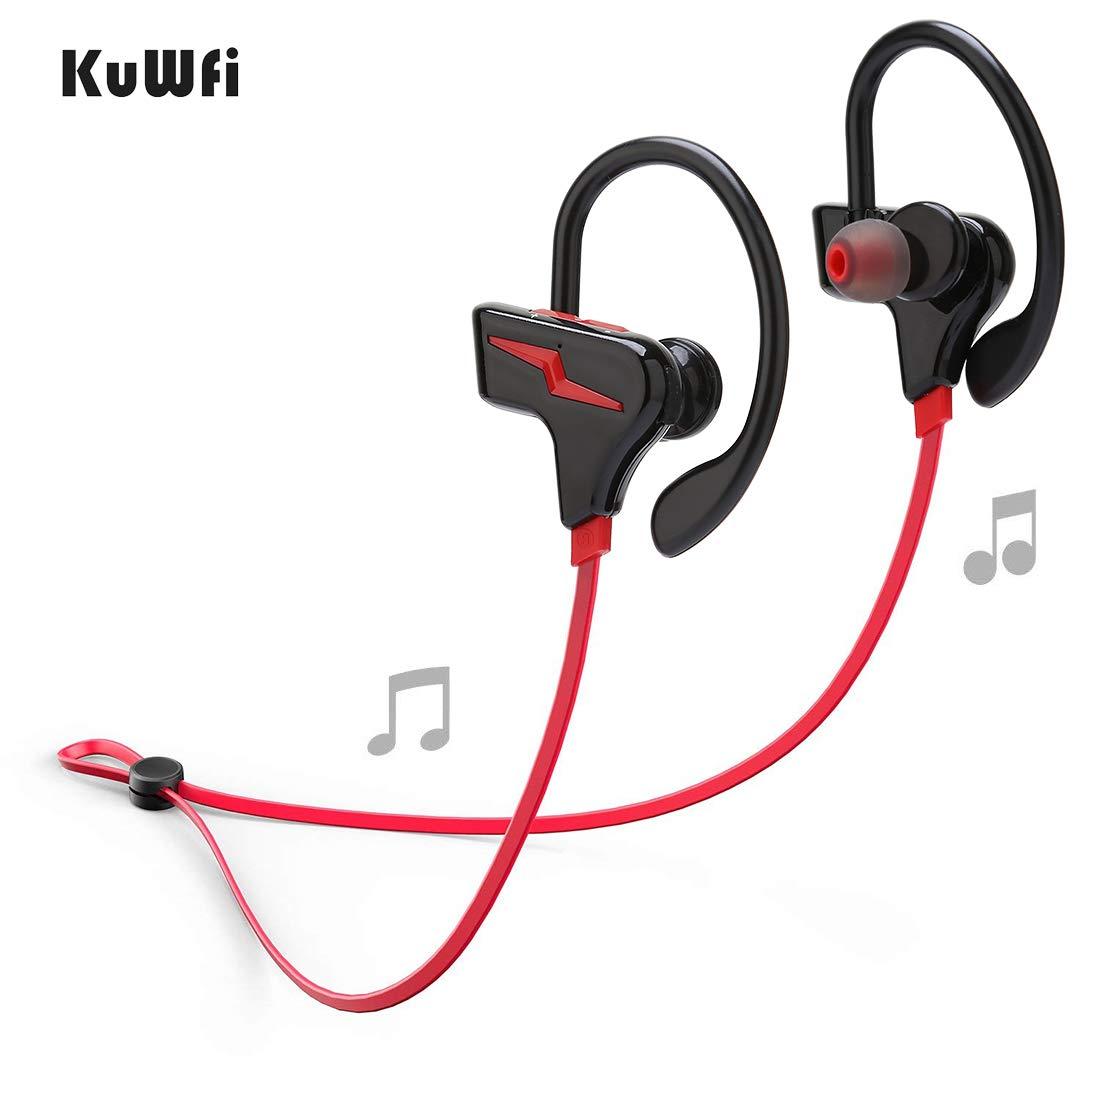 KuWFi Sport Bluetooth Headphones, Wireless Earphone With Mic Stereo Bluetooth Headset Wireless auriculares For Phone audifonos outdoor running